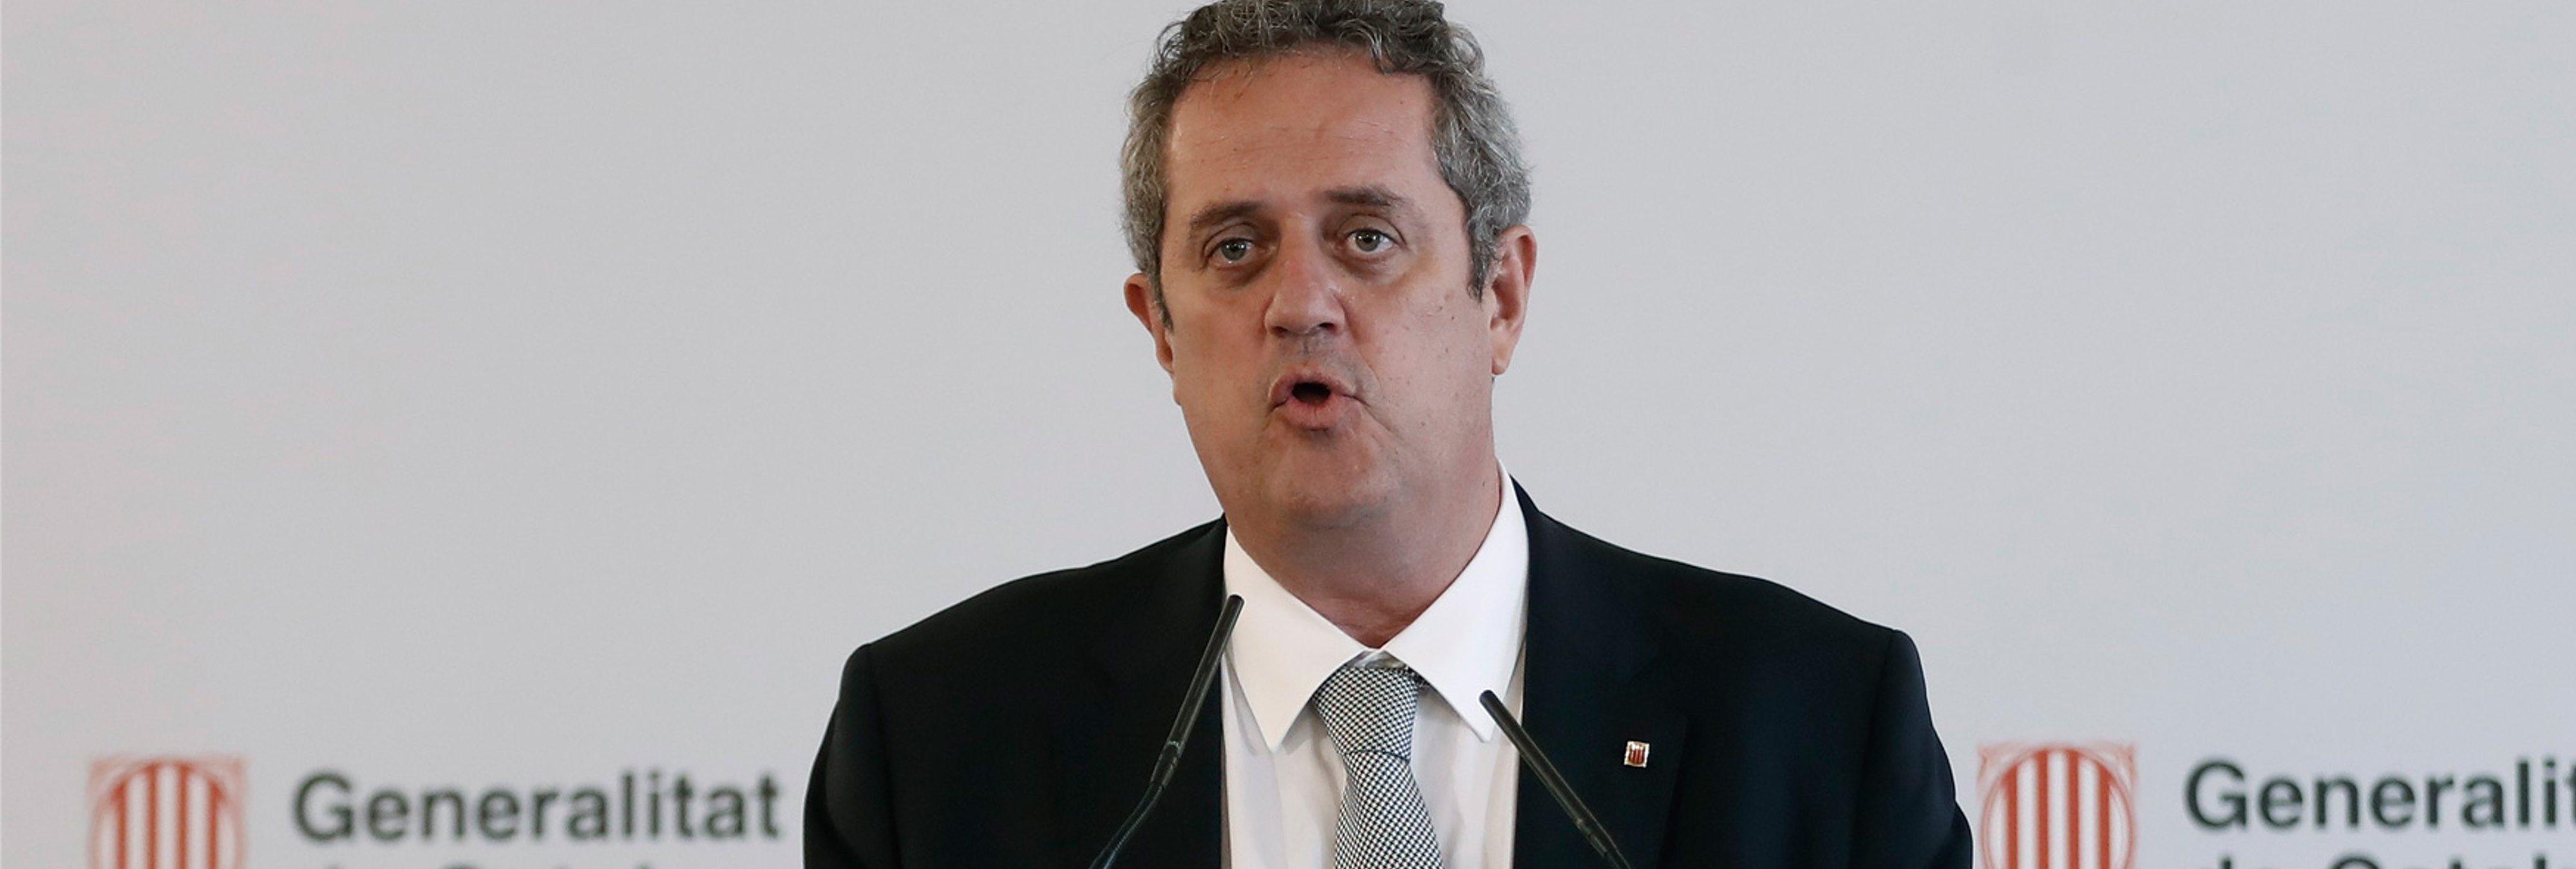 Joaquim Forn contrae la bacteria de la tuberculosis en la cárcel de Estremera